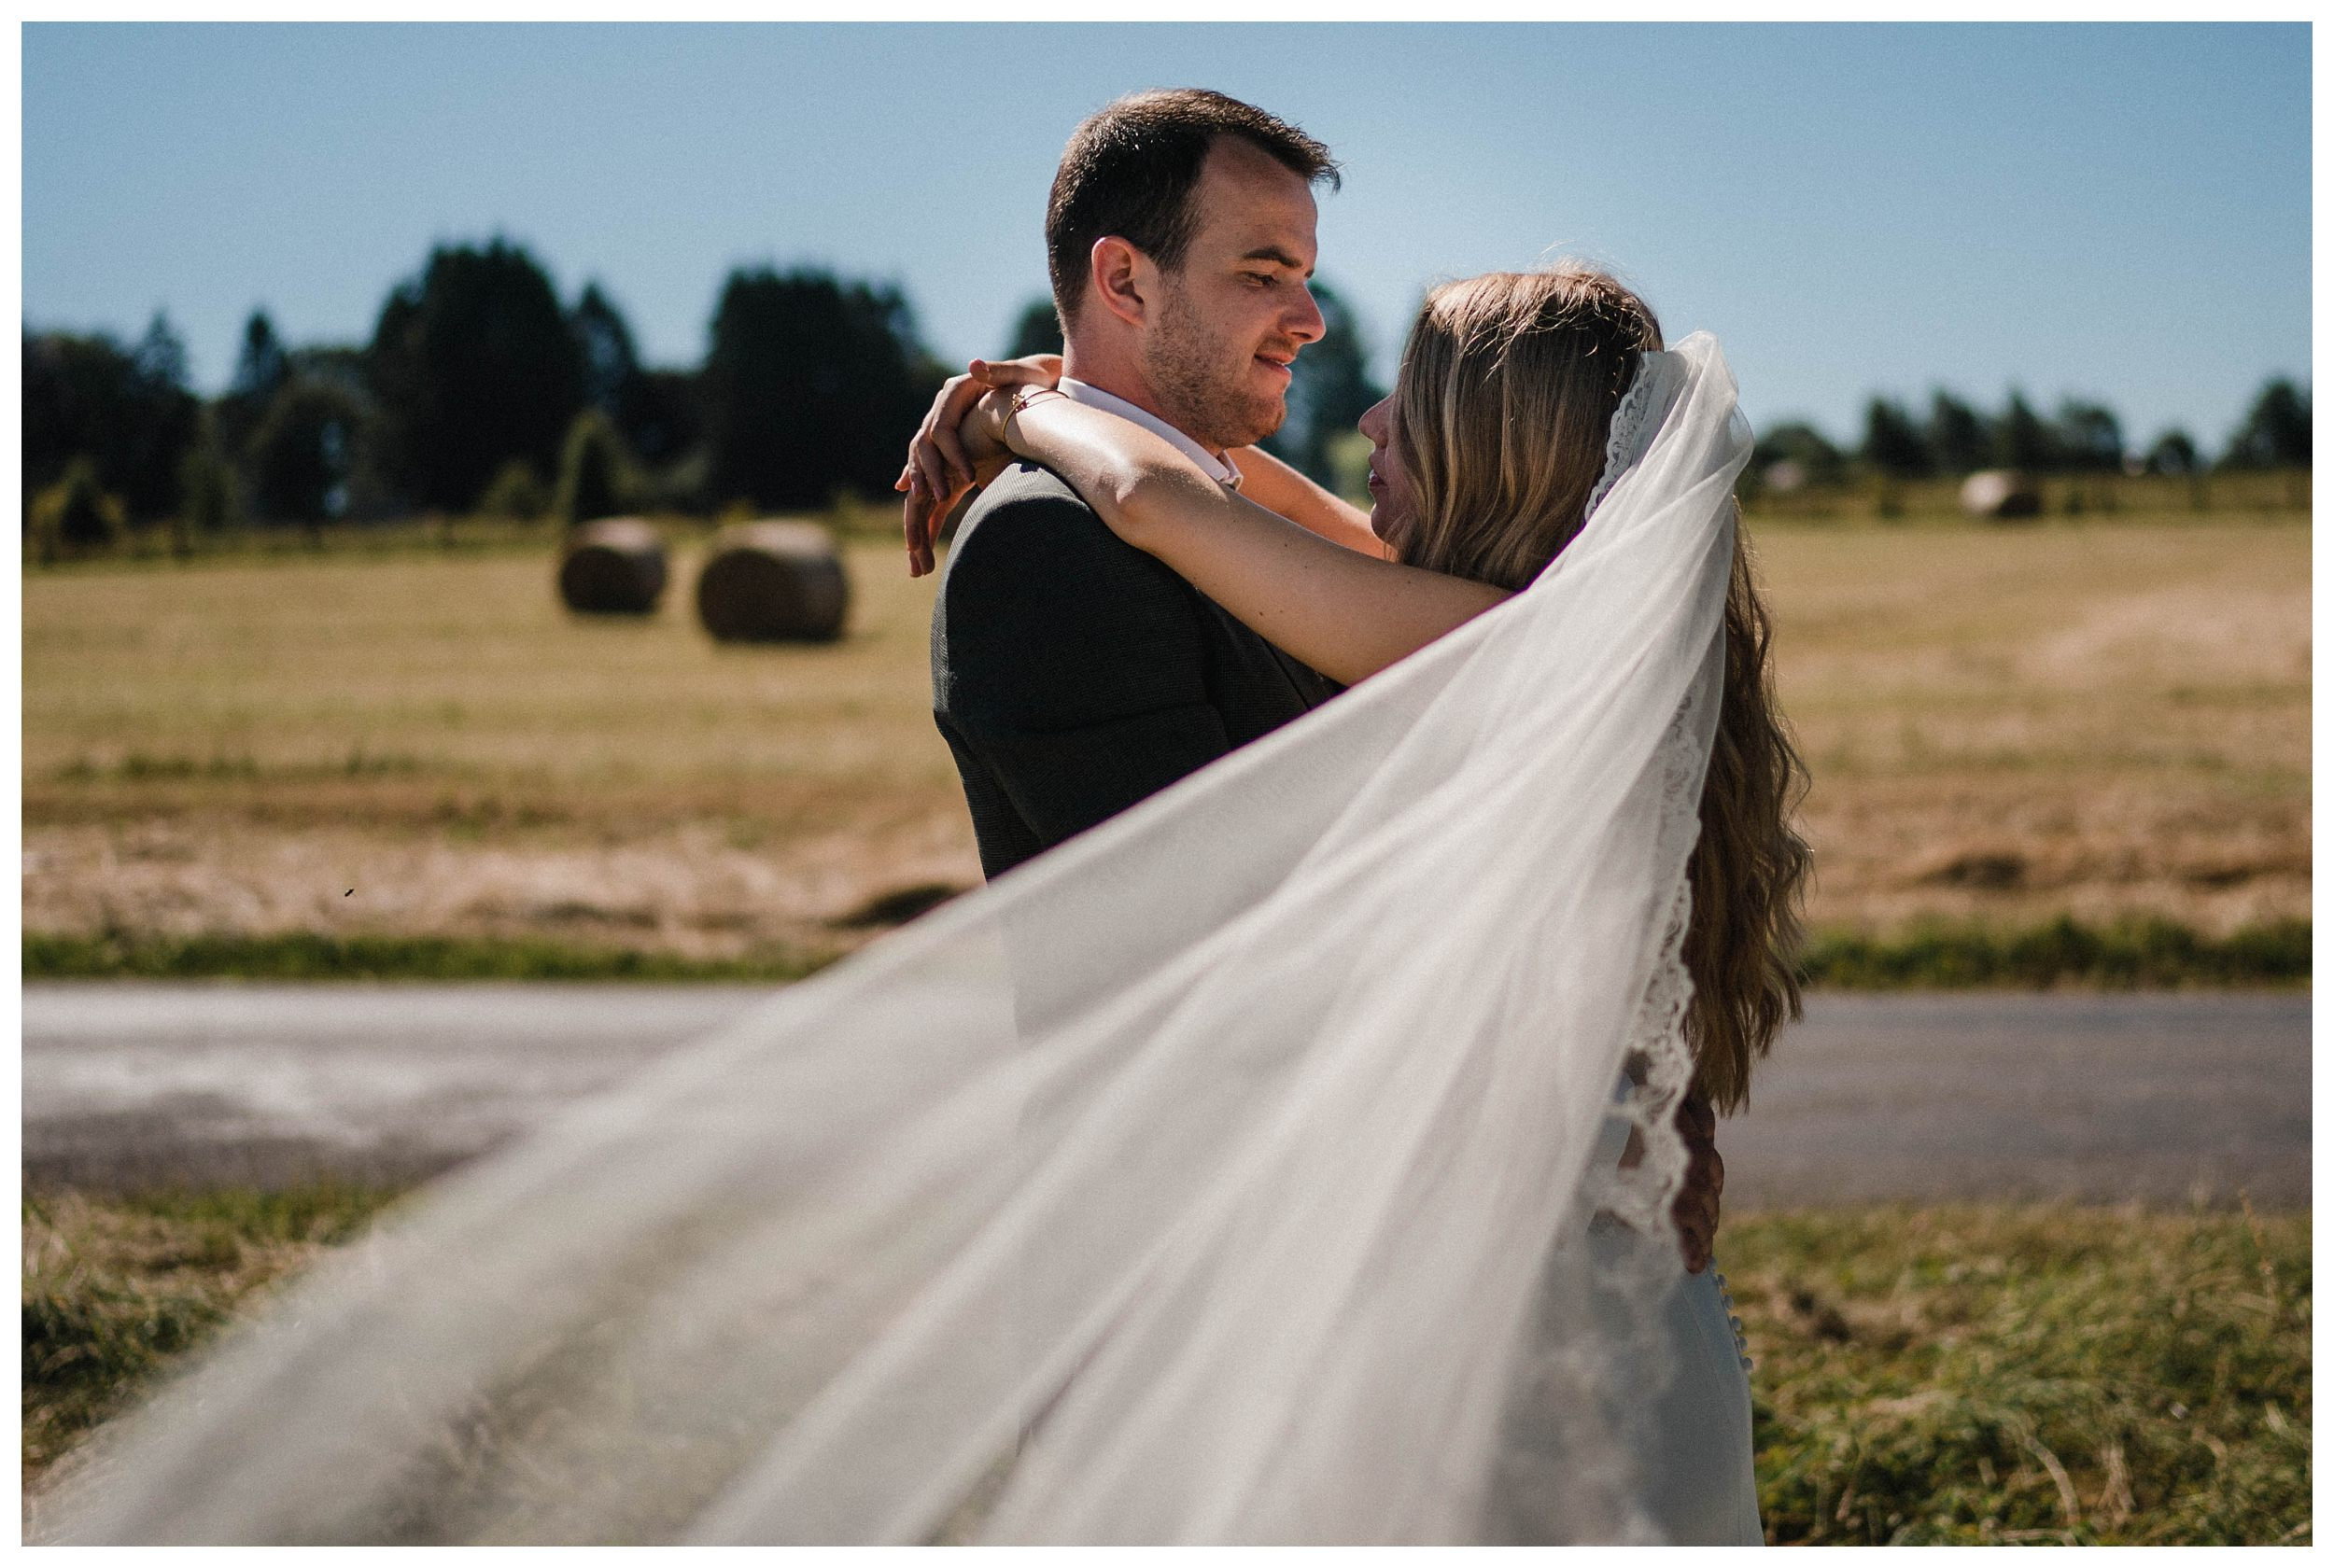 huwelijksfotograaf bruidsfotograaf destinationwedding huwelijksfotografie in ardennen nederland (34).jpg